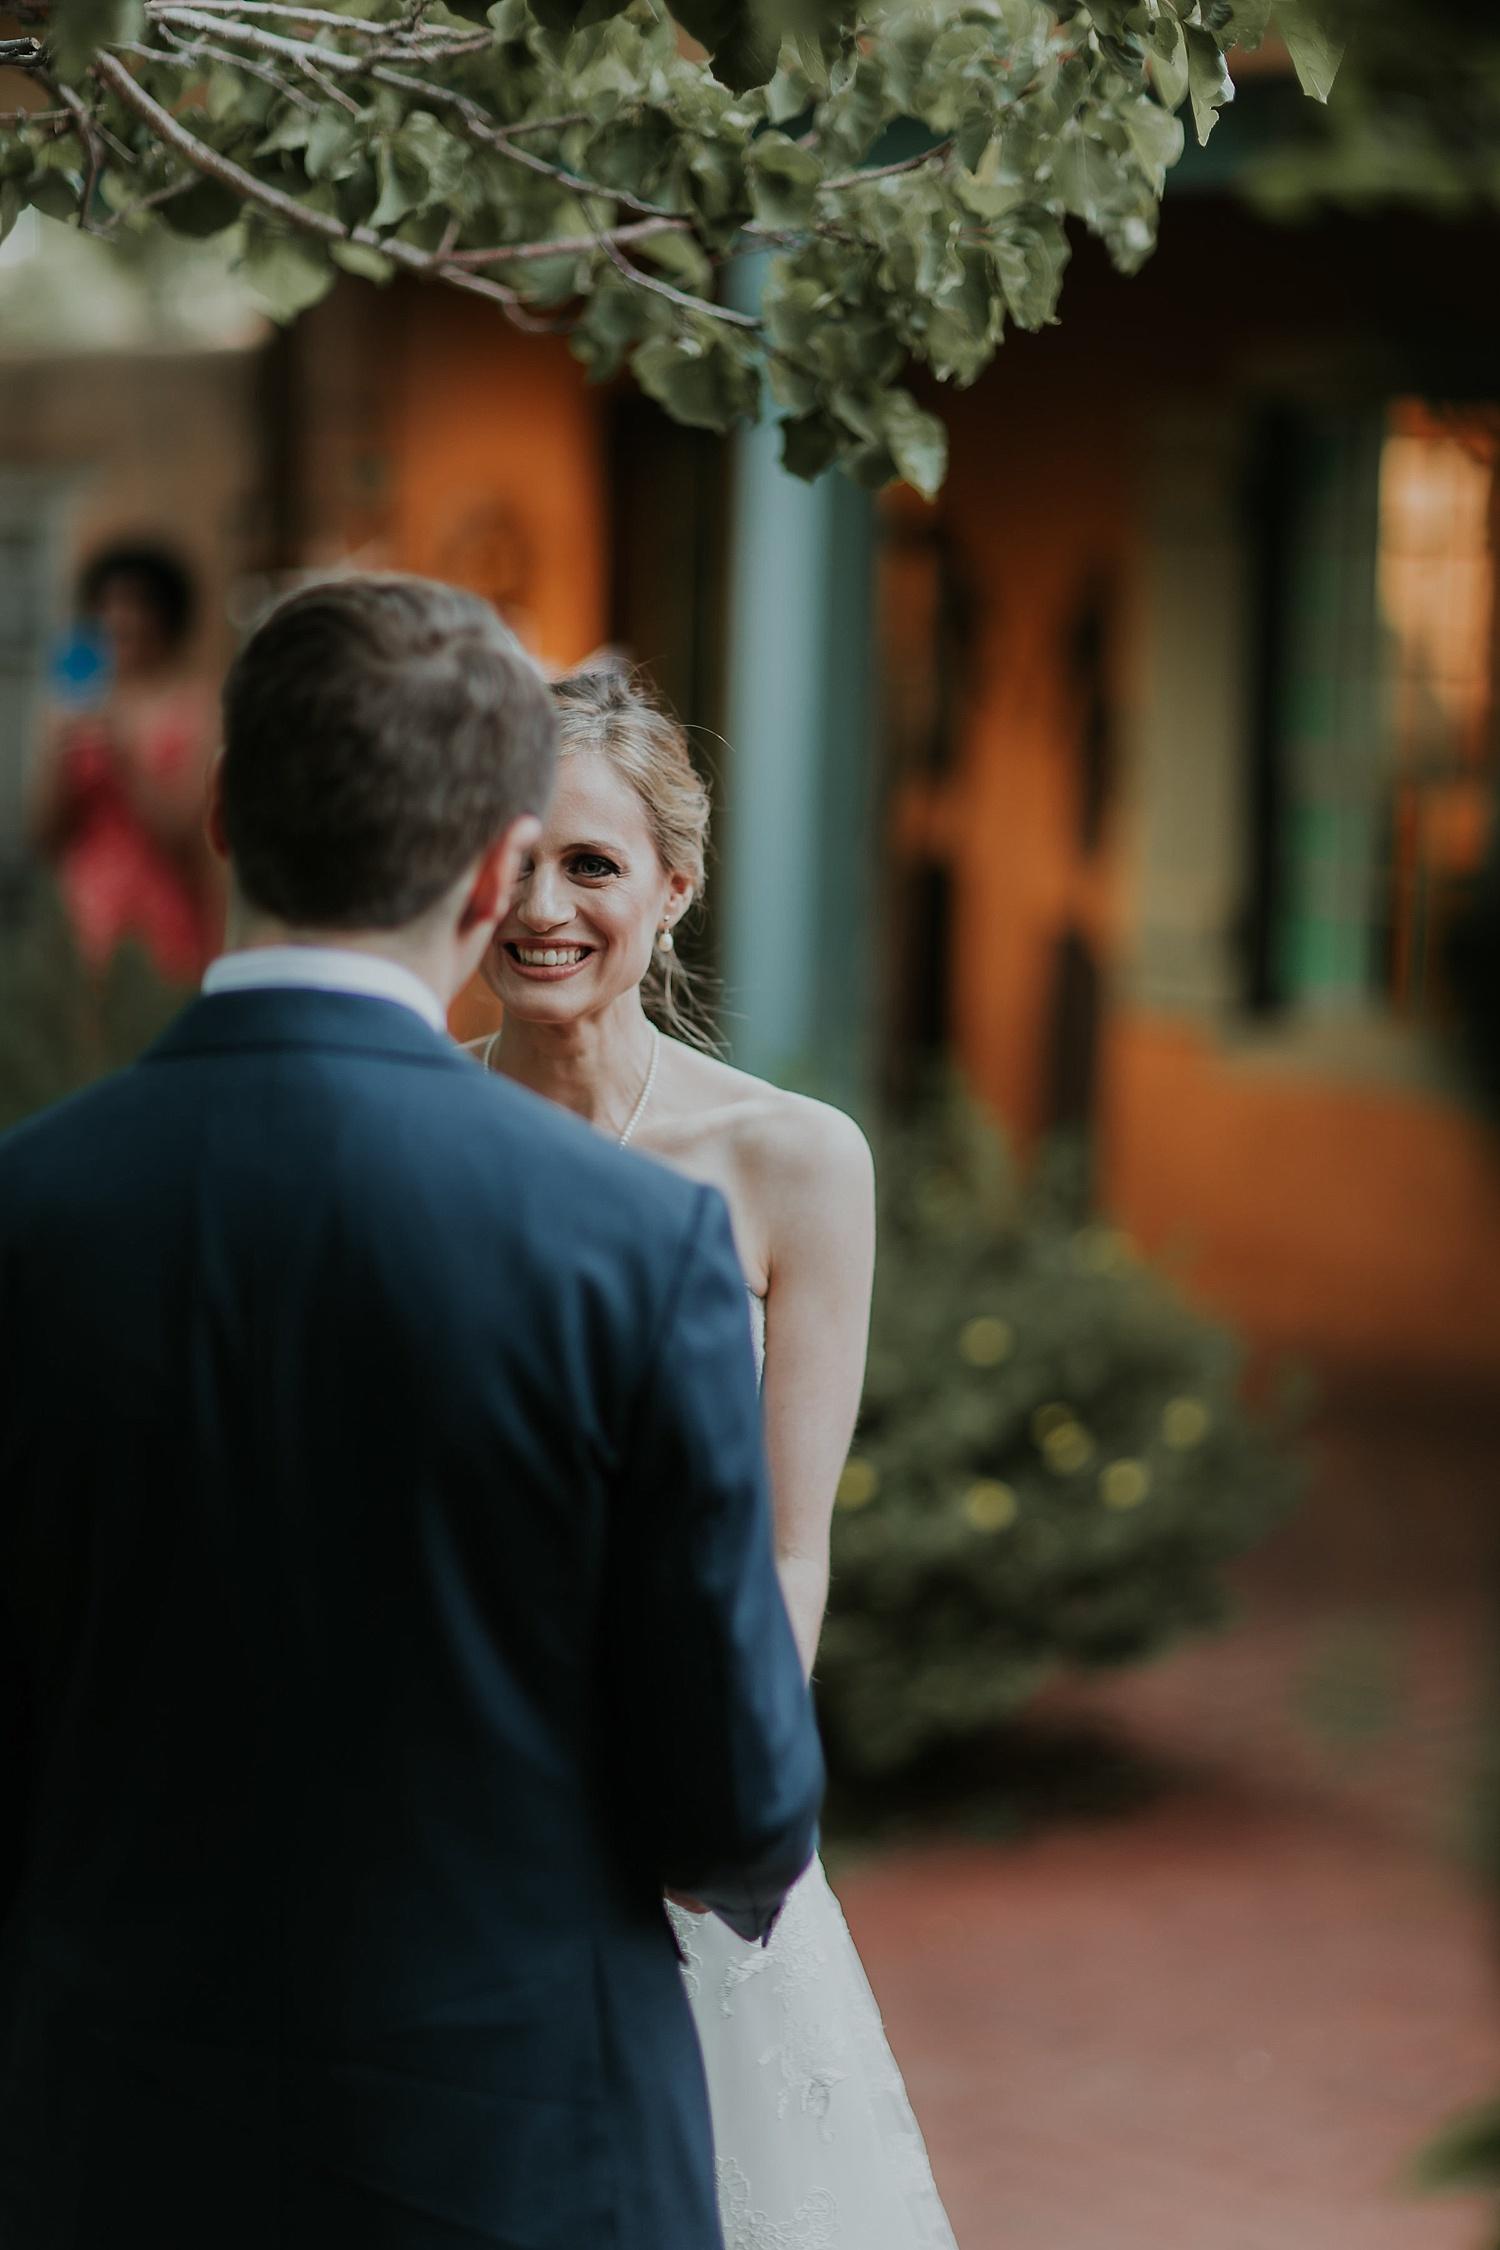 Alicia+lucia+photography+-+albuquerque+wedding+photographer+-+santa+fe+wedding+photography+-+new+mexico+wedding+photographer+-+gerald+peters+gallery+wedding_0017.jpg